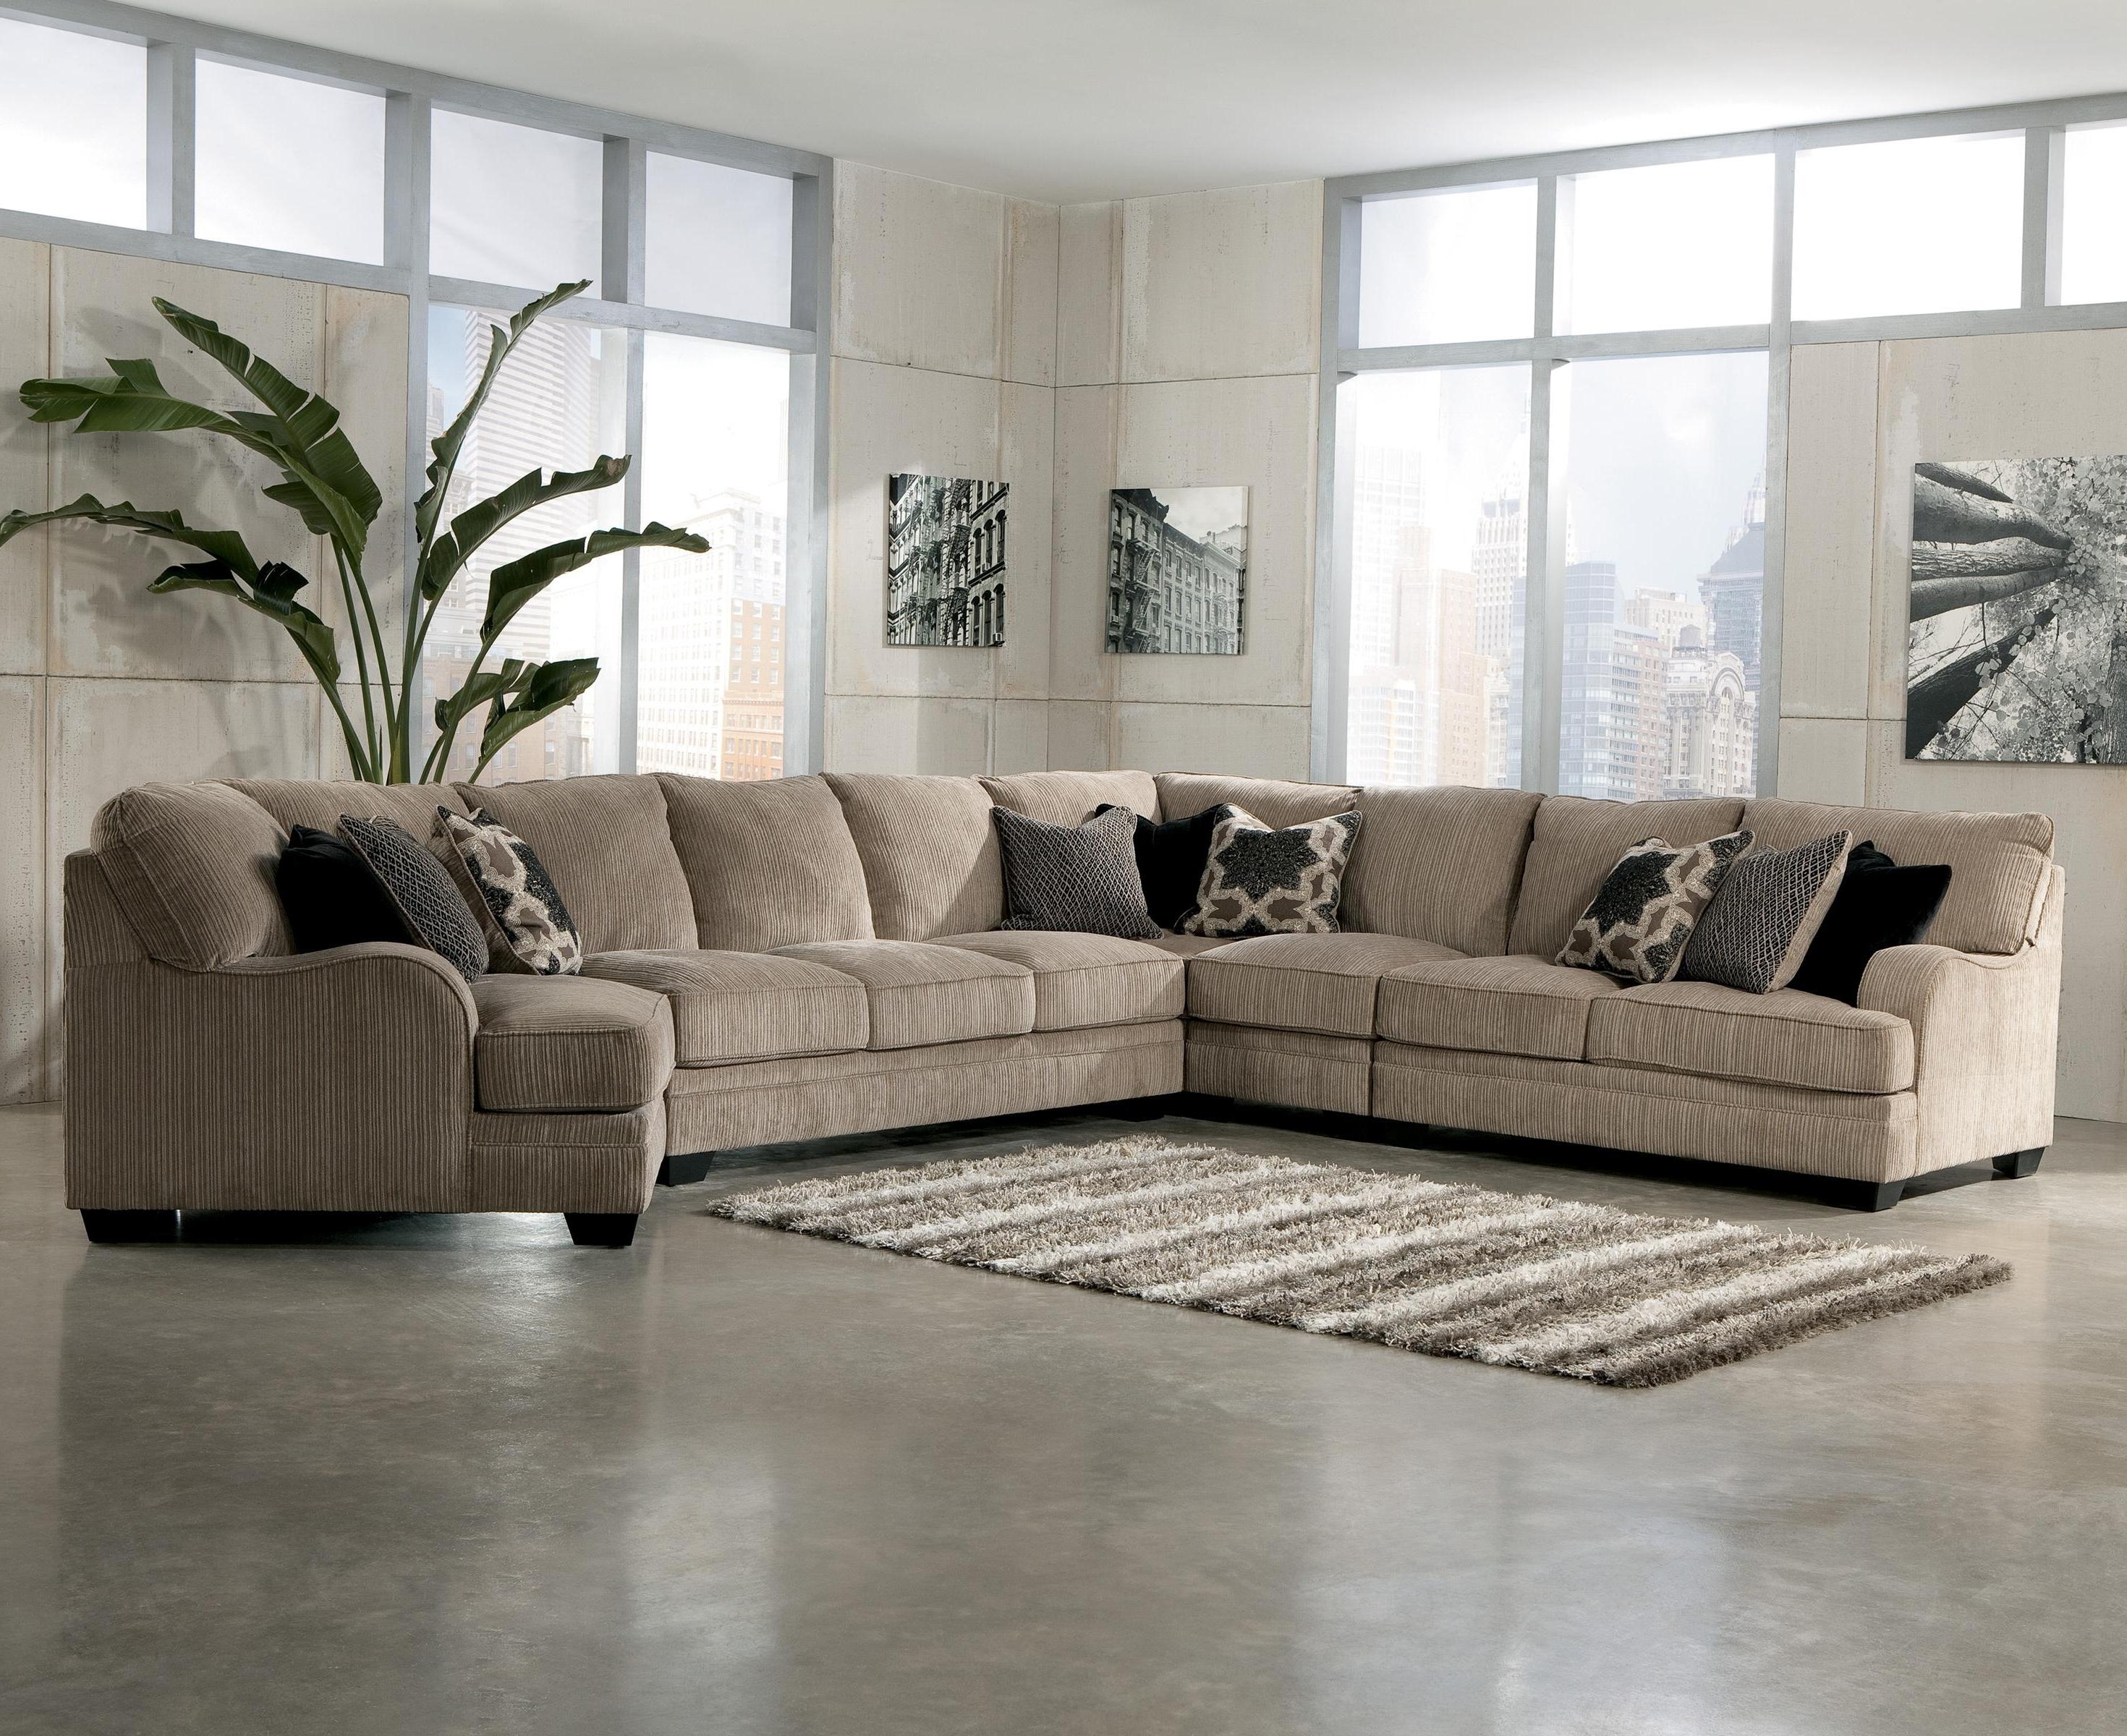 Recent Clarksville Tn Sectional Sofas Pertaining To Signature Designashley Katisha – Platinum 5 Piece Sectional (View 11 of 15)